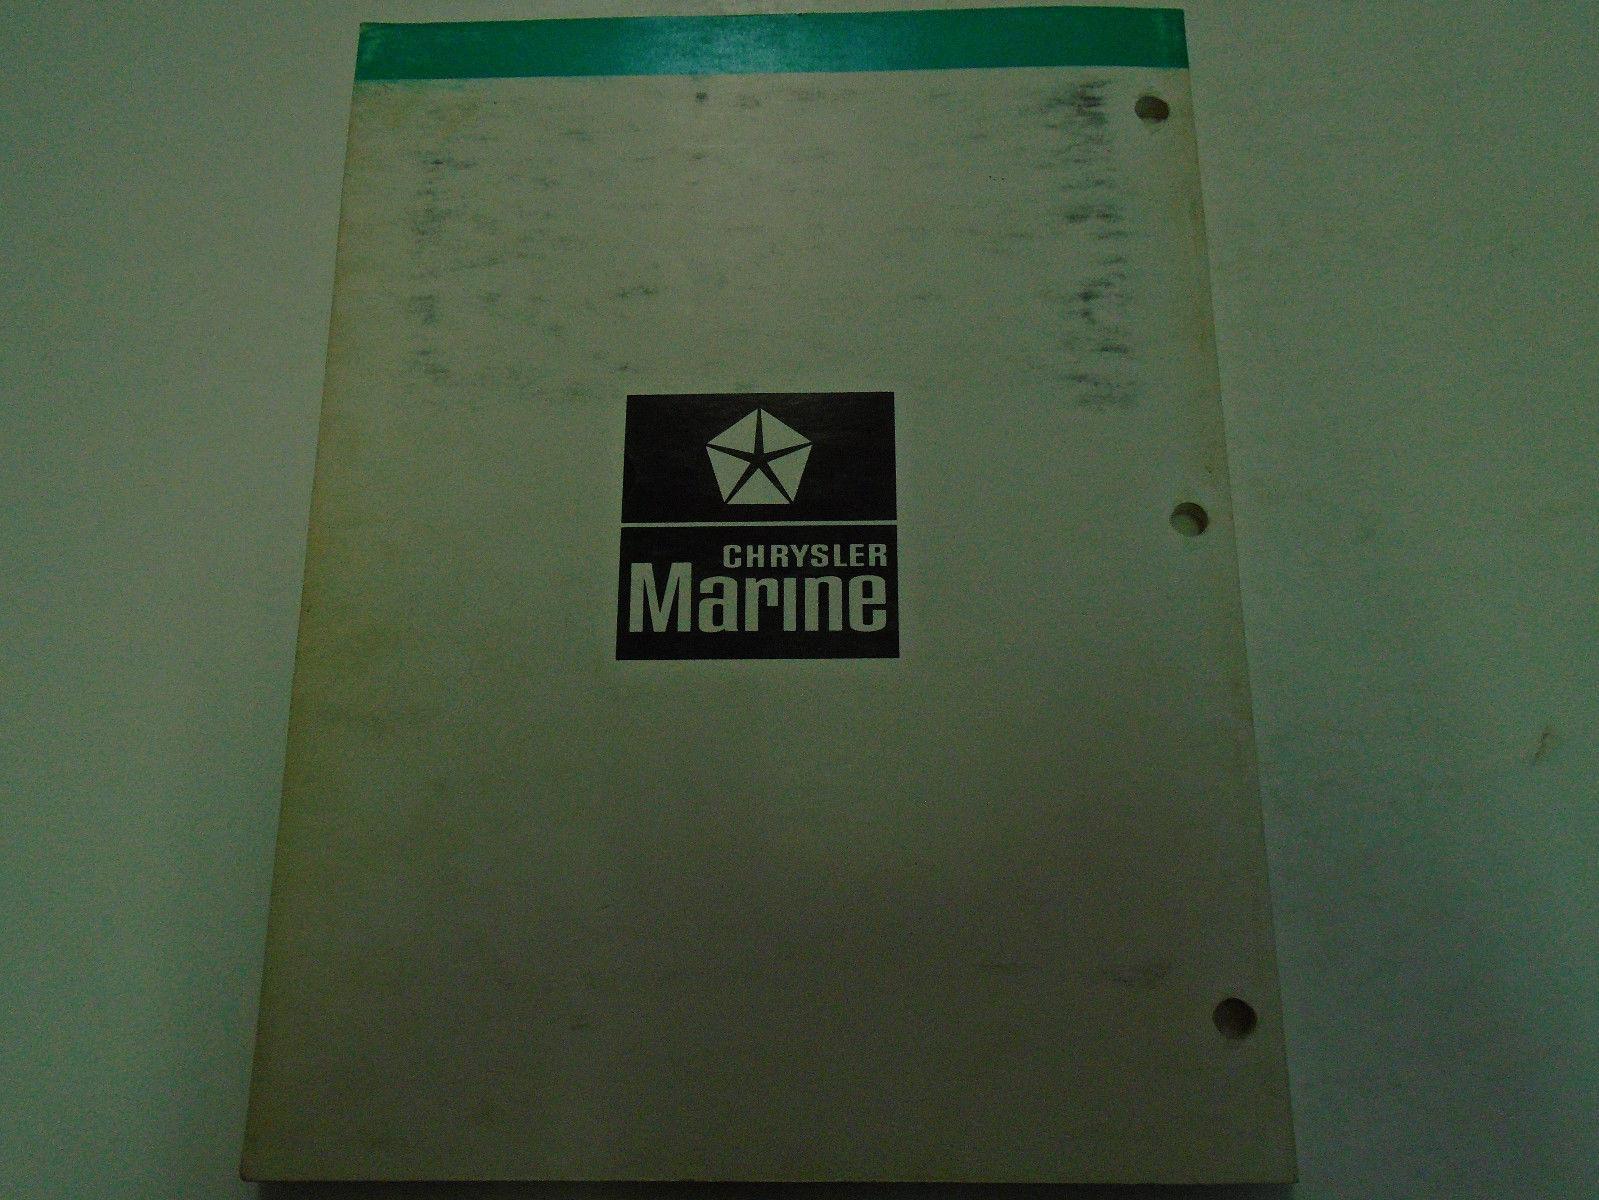 1980 Chrysler Outboard 4 HP Service Repair Shop Manual Factory OEM Book Used